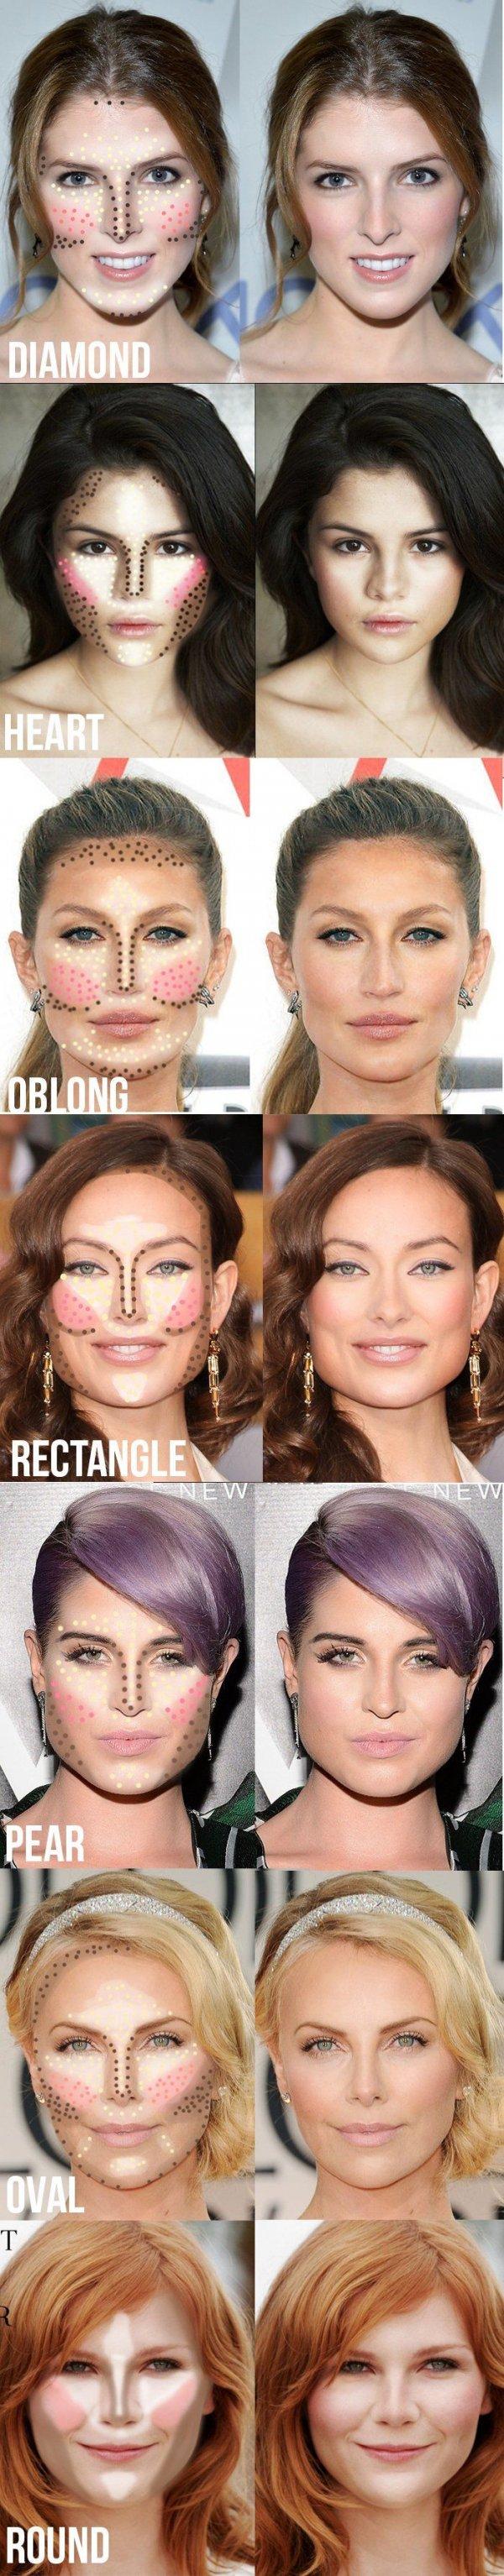 face,skin,head,lip,organ,